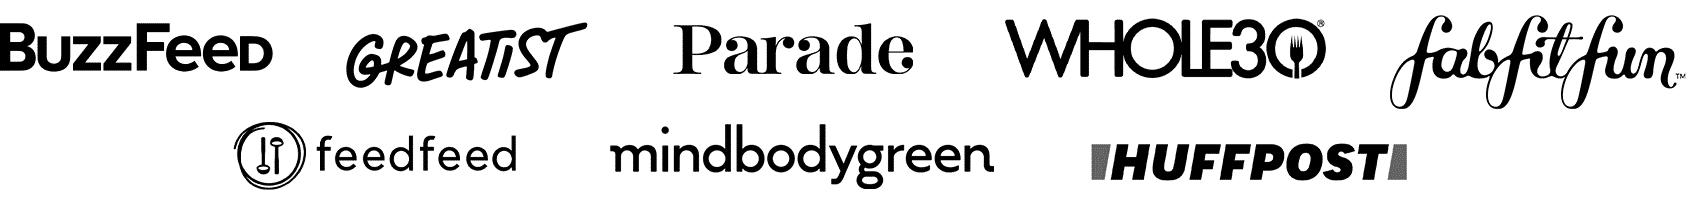 BuzzFeed, Greatist, Parade, Whole30, FitFabFun, FeedFeed, Mindbodygreen, Huffpost